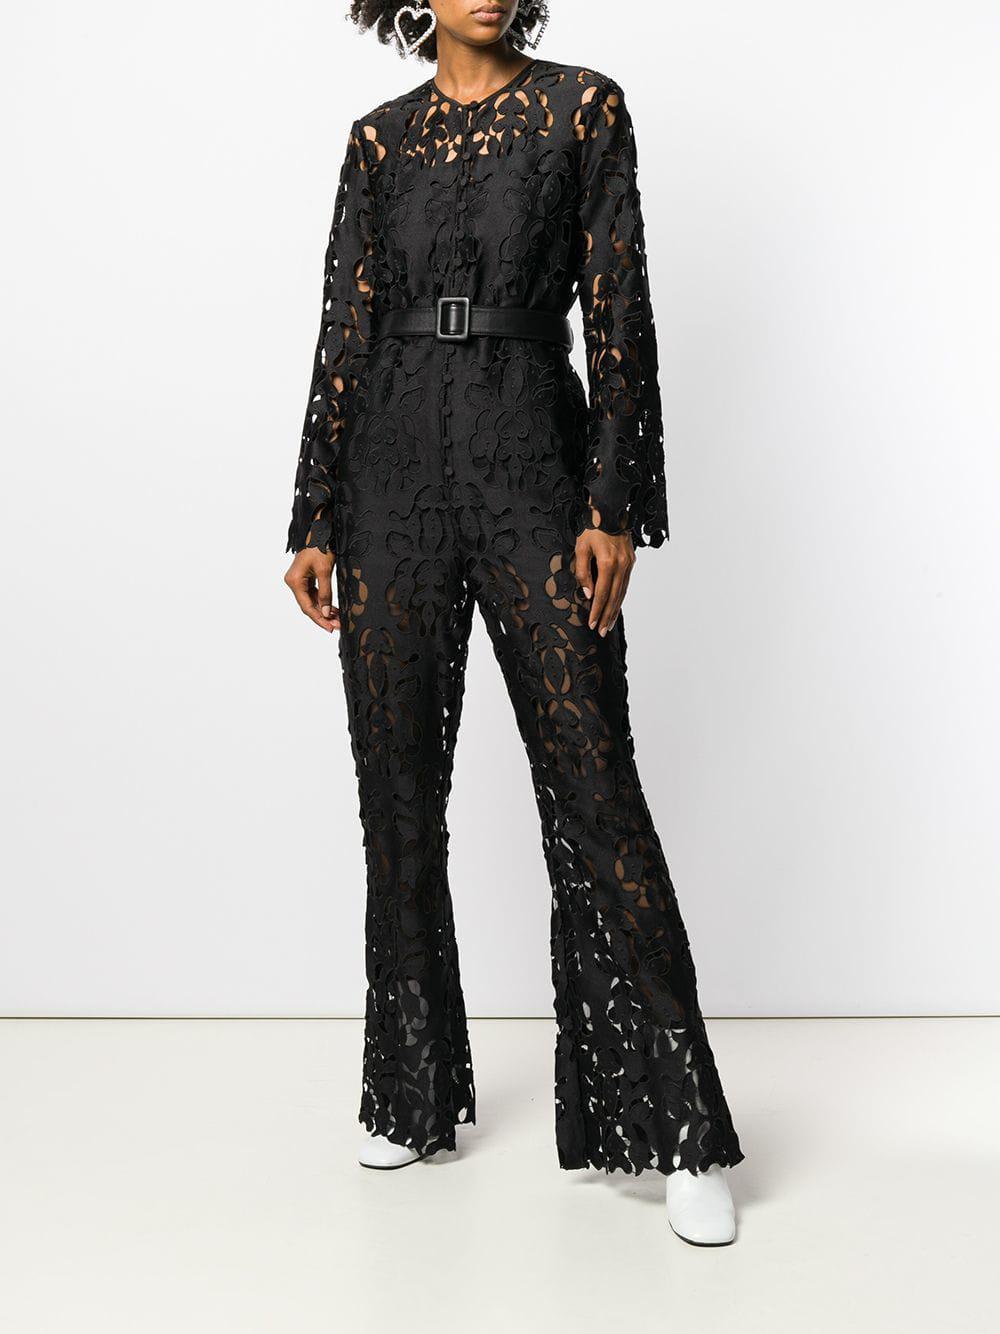 8eb8e4a2bbf Self-Portrait Floral Cut-out Jumpsuit in Black - Save 36% - Lyst